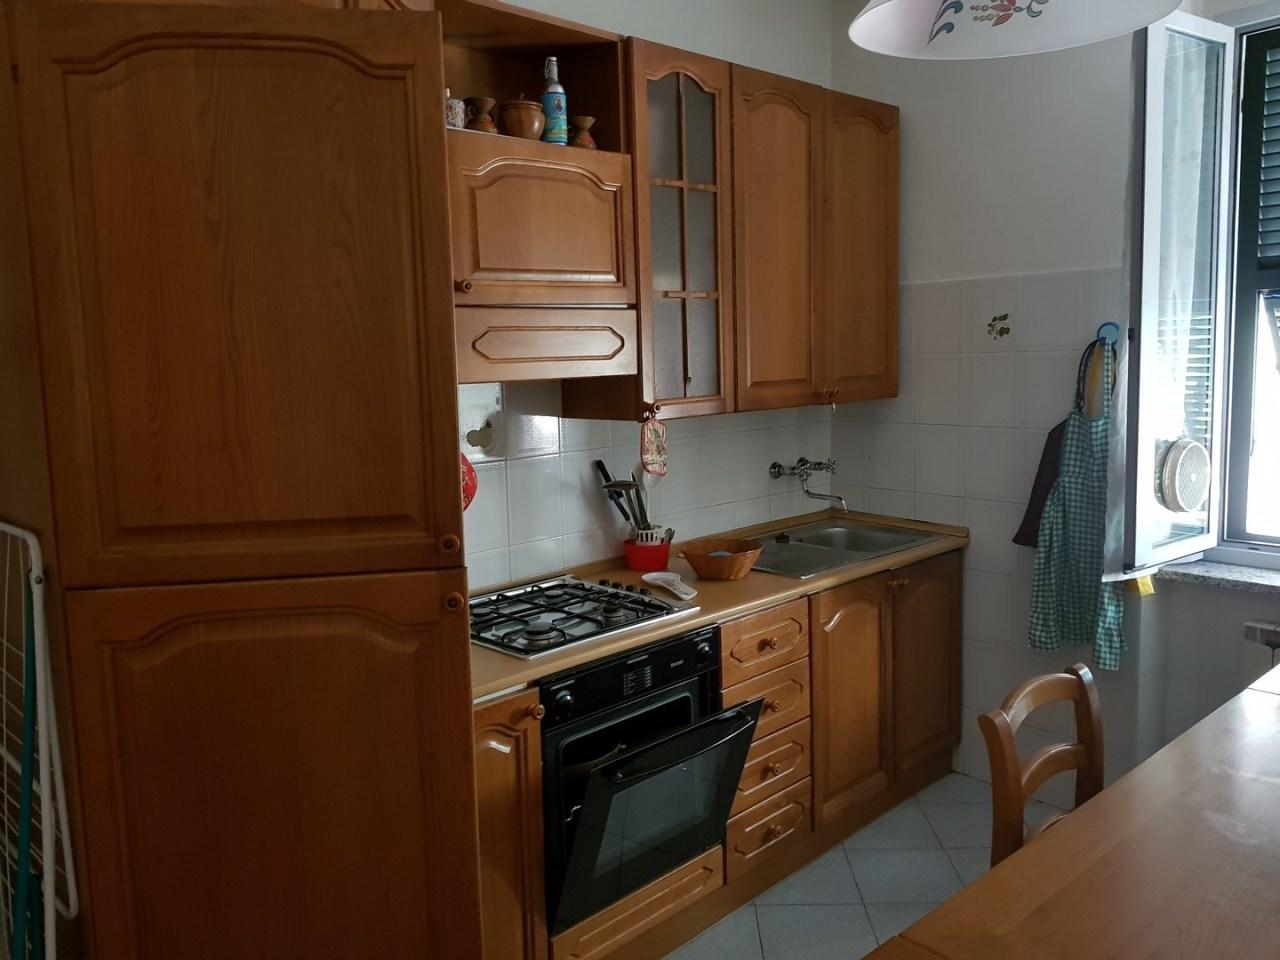 Appartamento - Appartamento a Santo Stefano di Magra